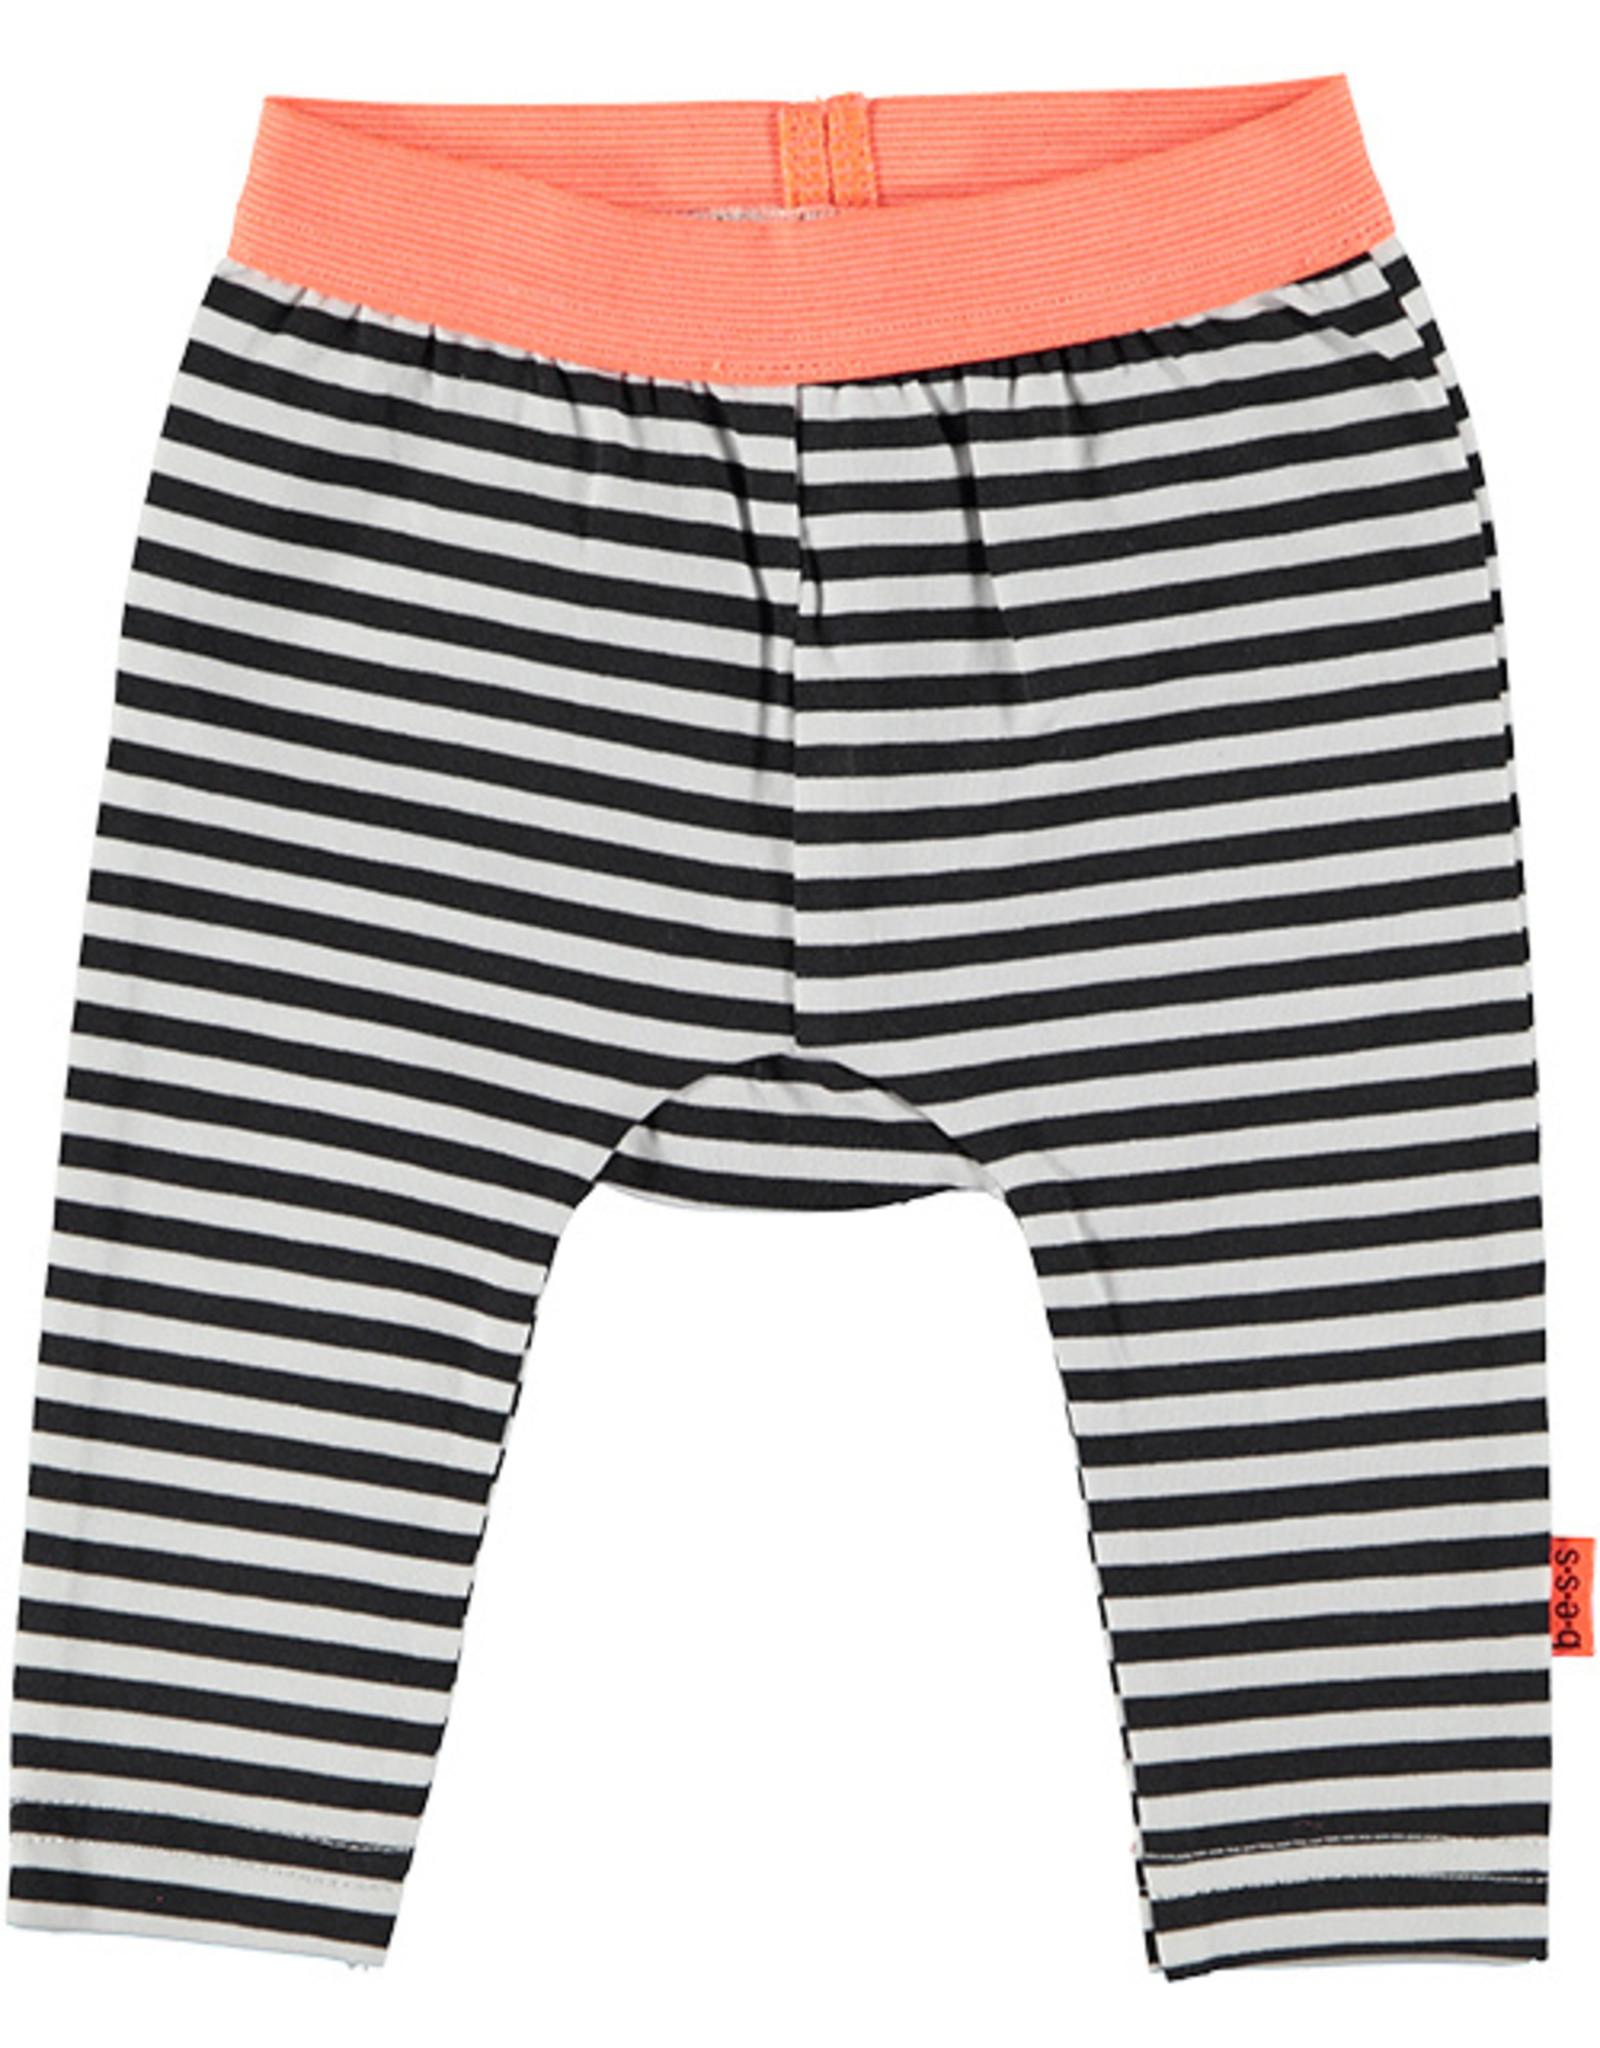 B.E.S.S. Legging Striped, Black